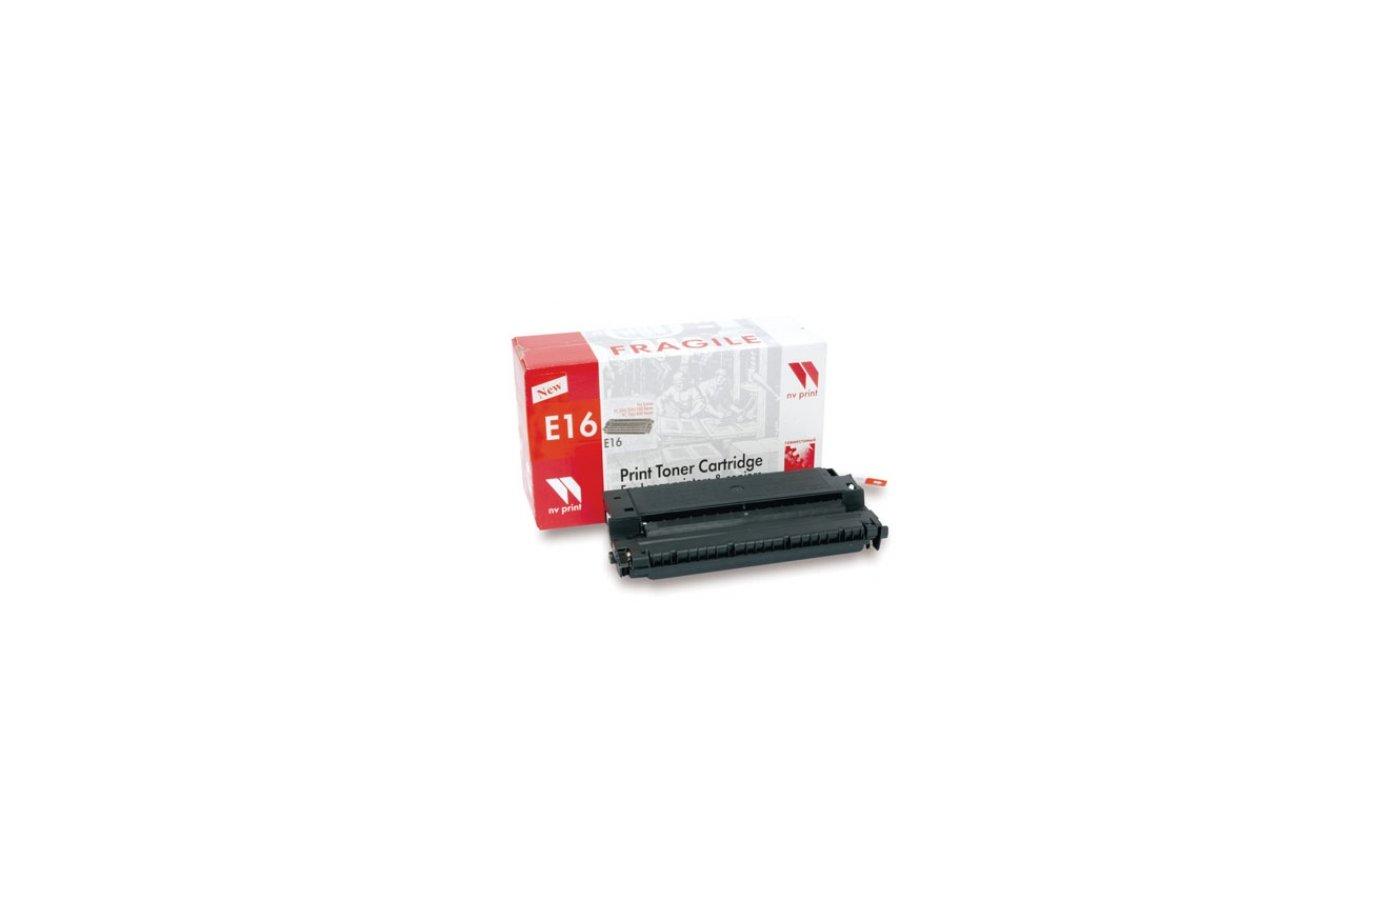 Картридж лазерный NV-Print совместимый Canon E-16 для FC-2xx/3xx/530/108/208 PC-7xx PC-8xx. Чёрный. 2000 страниц.